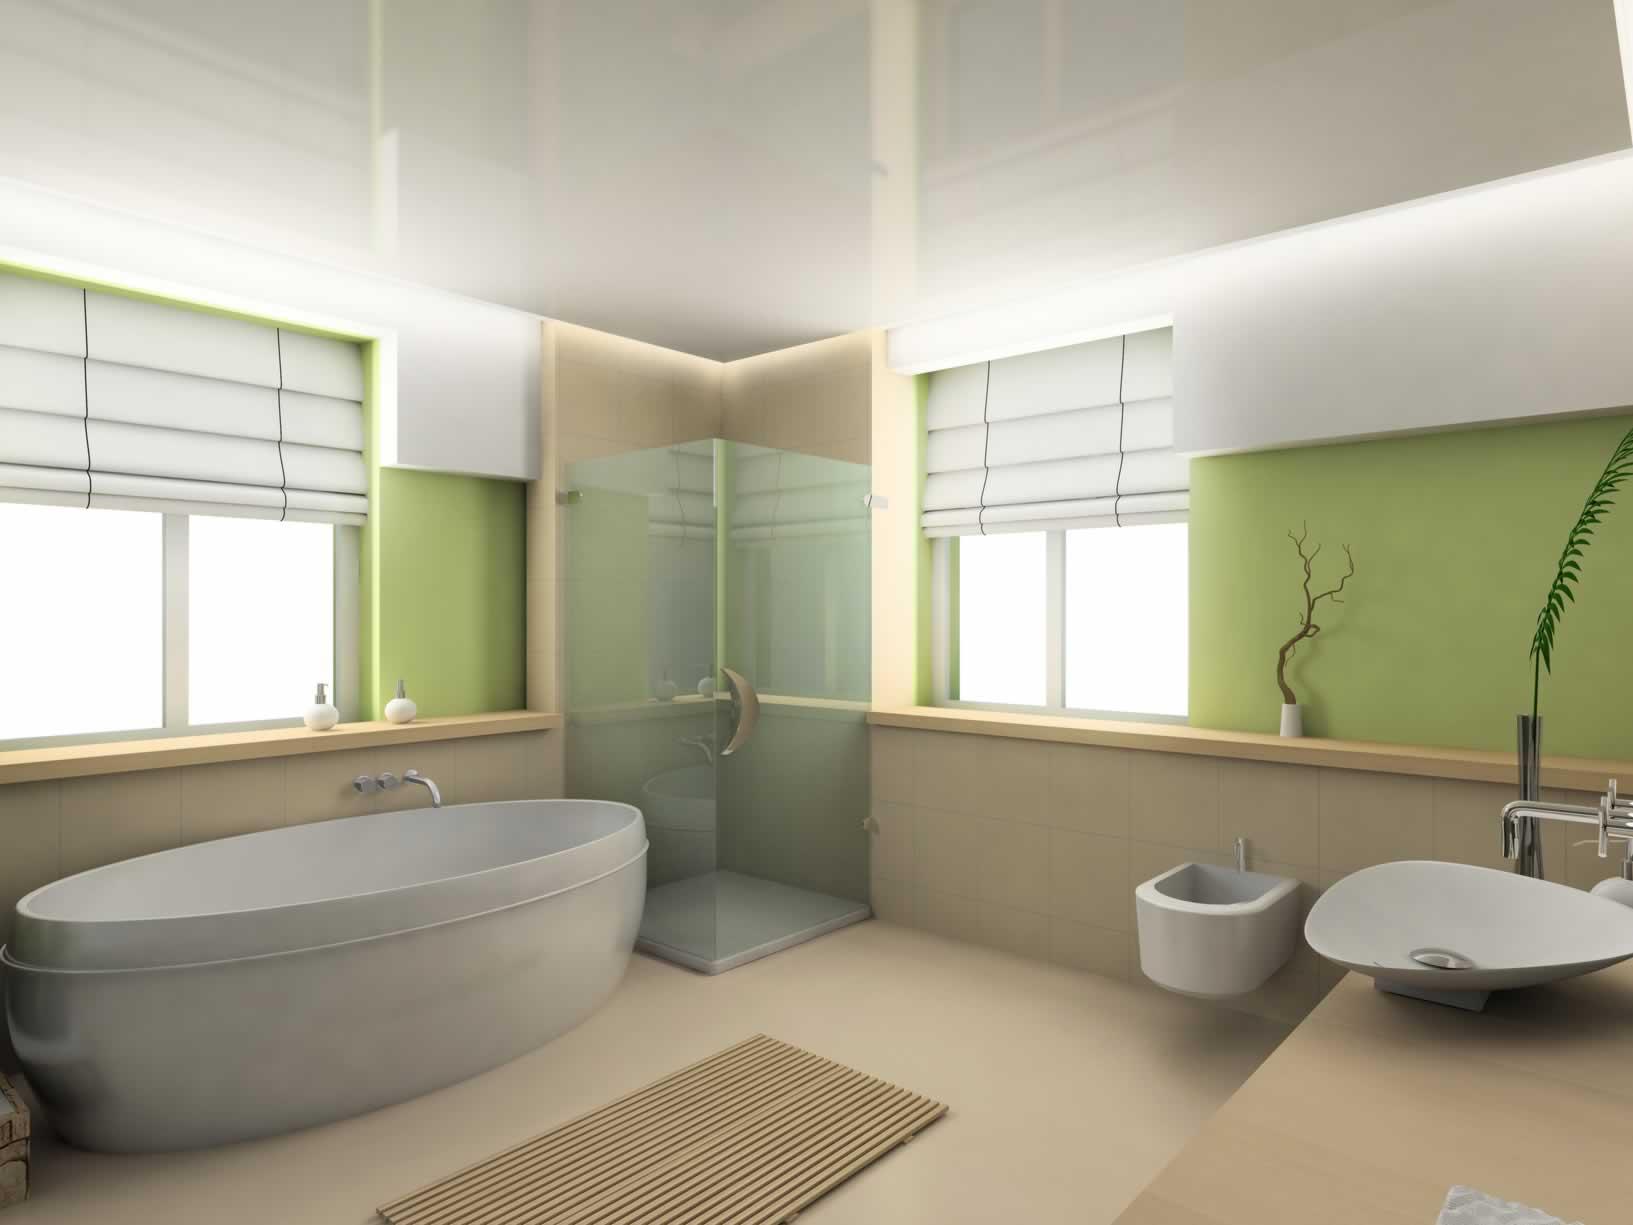 home design - inspirationen, Deko ideen